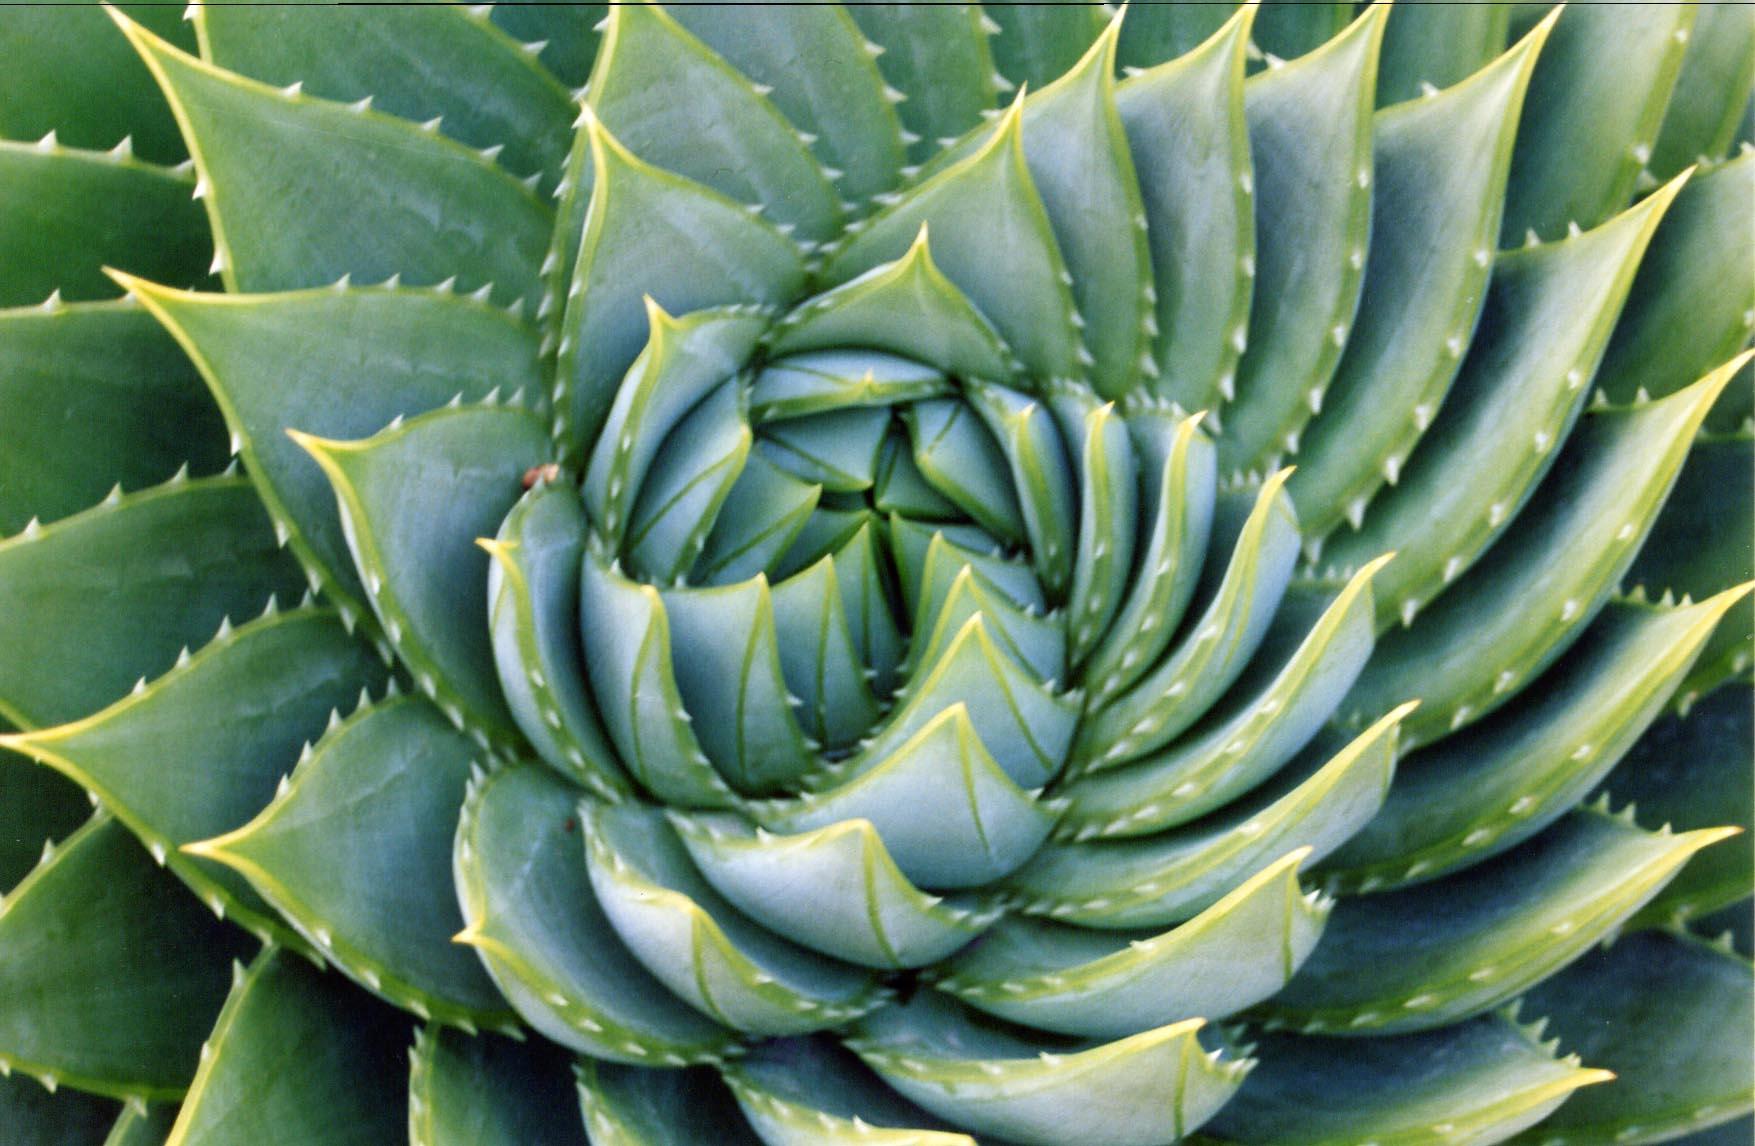 Aloe leaves in a fibonacci spiral. Image credit Kai Schrieber